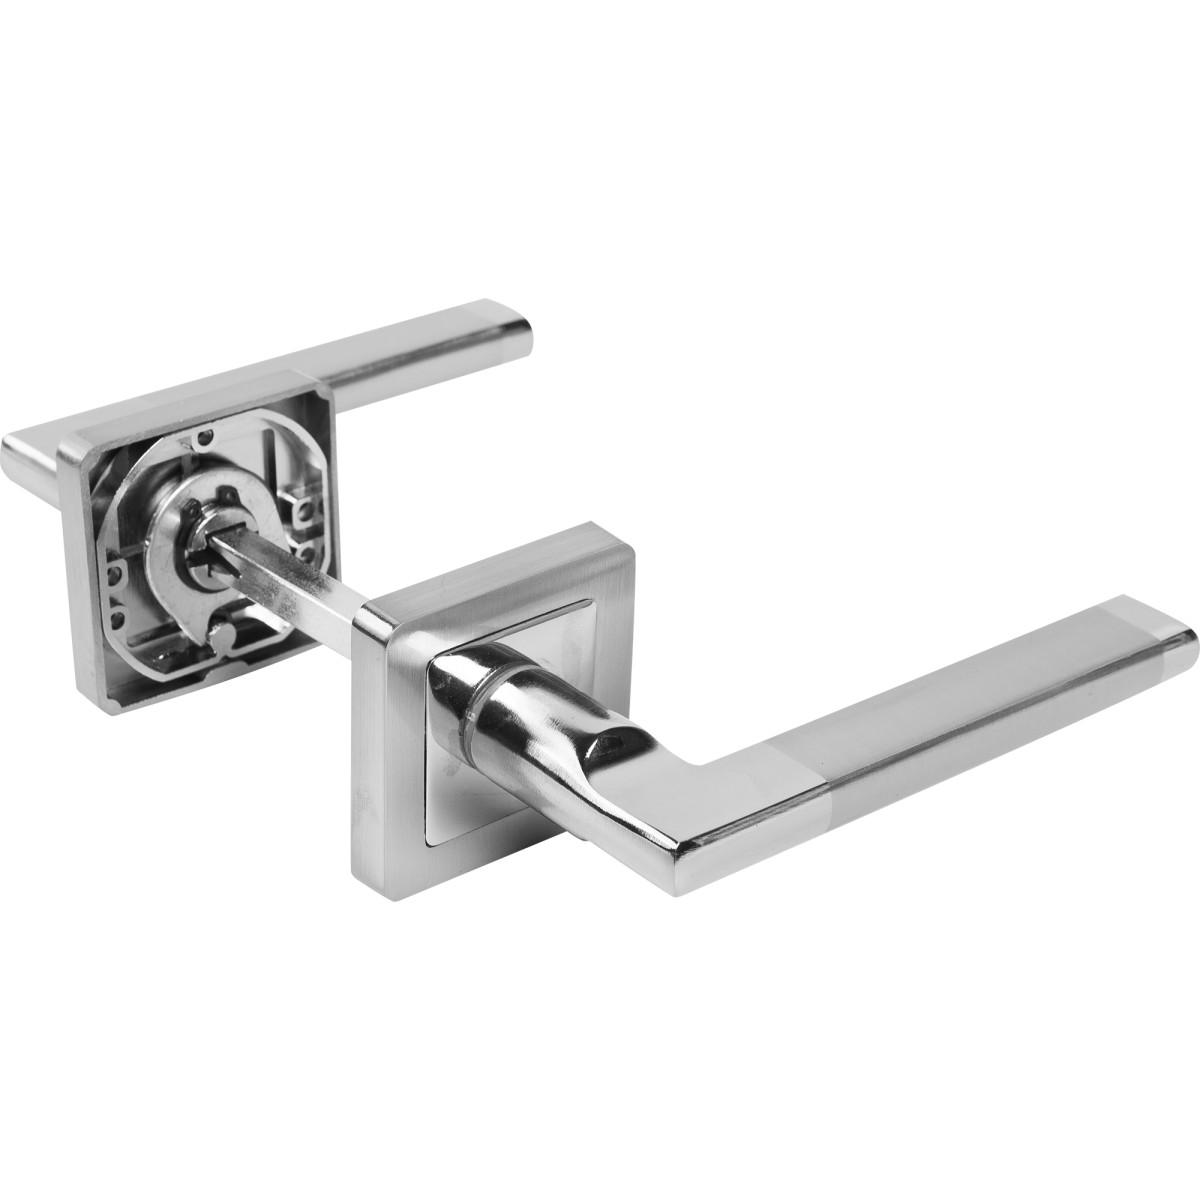 Дверная ручка Apecs H-22050-A-CRM/CR без запирания цвет хром